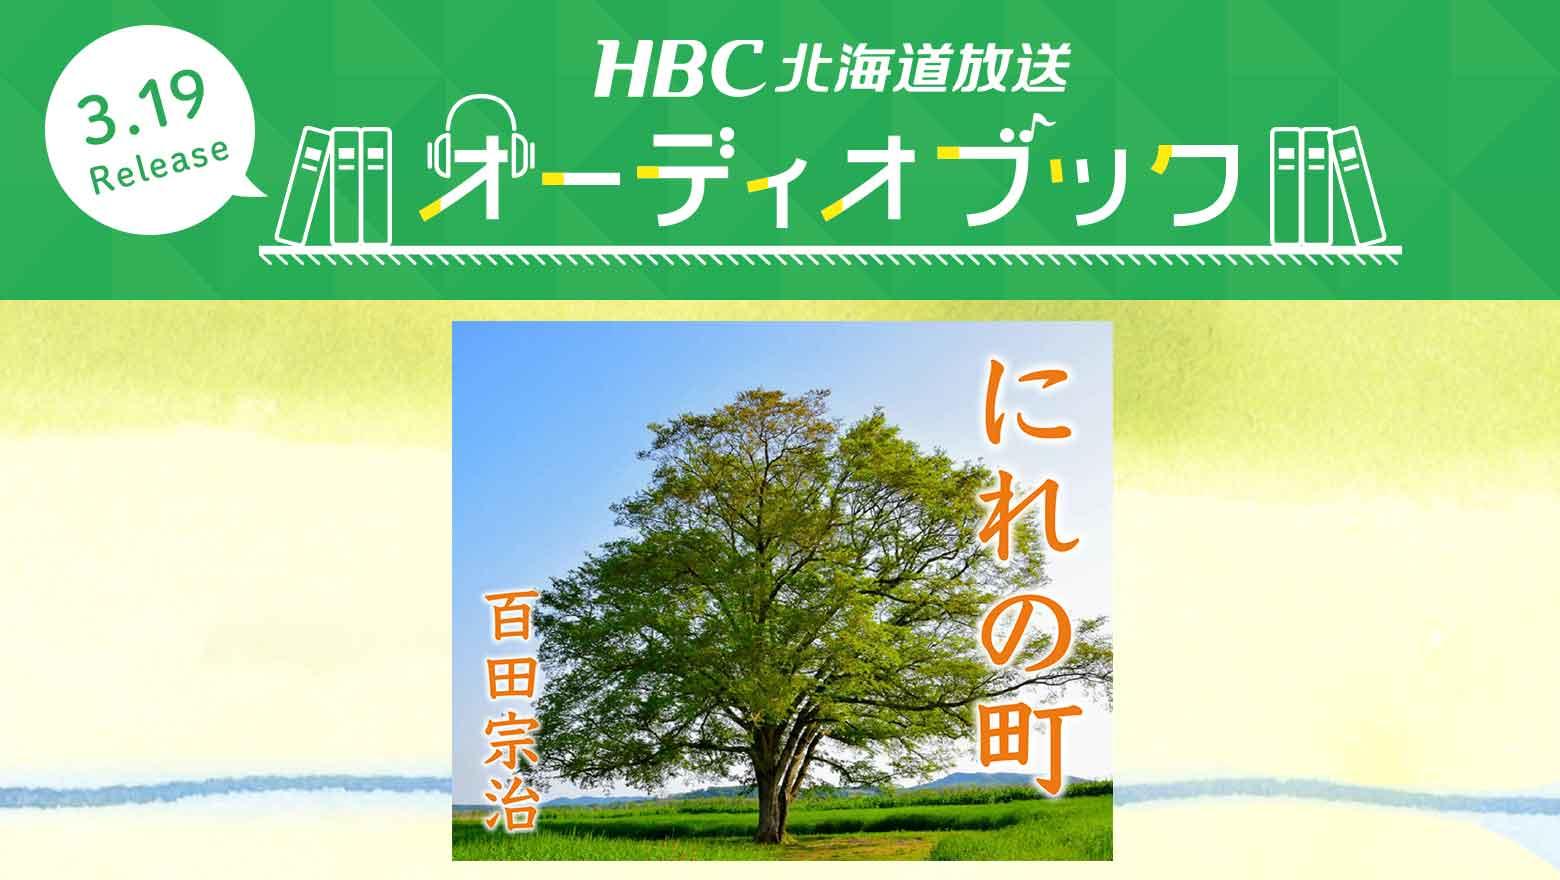 HBC北海道放送 オーディオブック